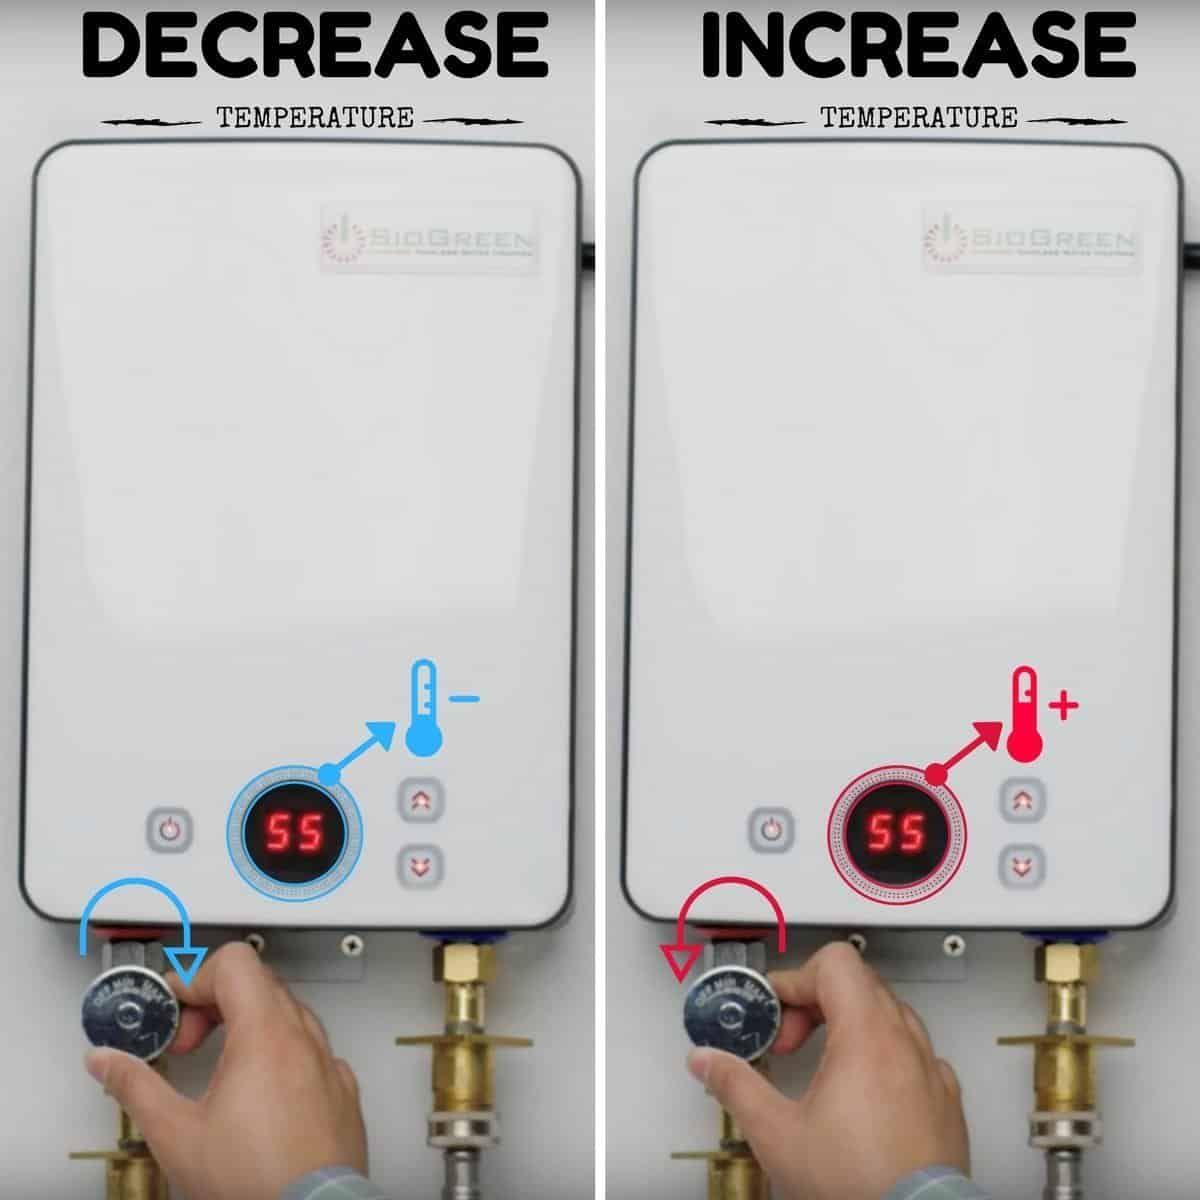 Best Electric Tankless Water Heaters In 2020 Complete Reviews Guide Tankless Water Heater Water Heater Heater